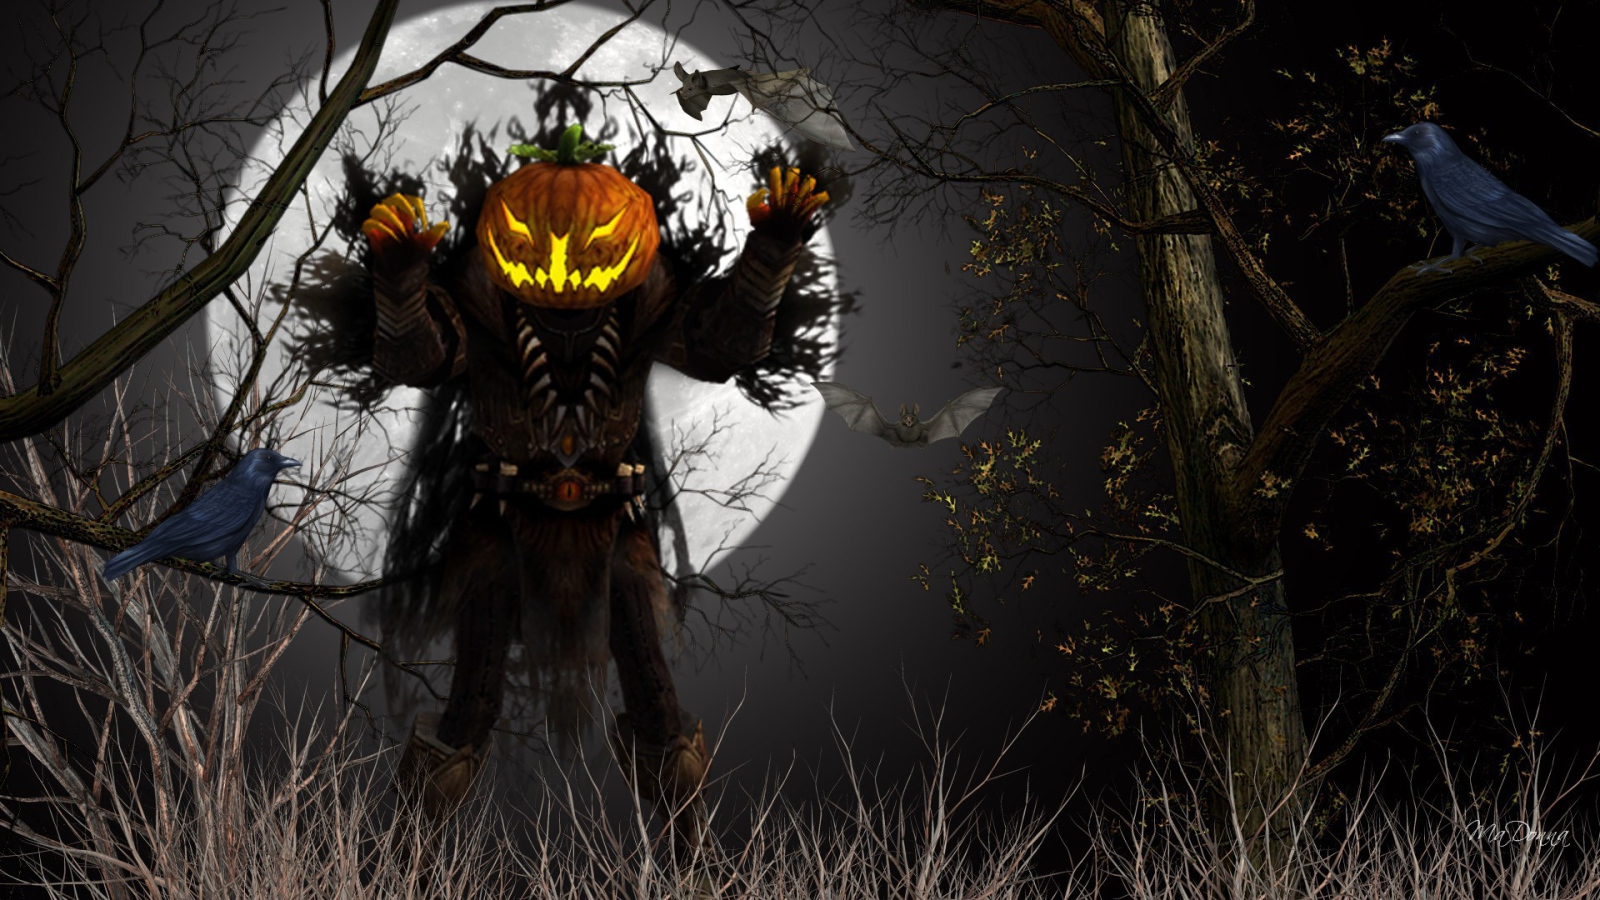 Halloween Ghost Wallpaper Halloween Holidays (61 ...